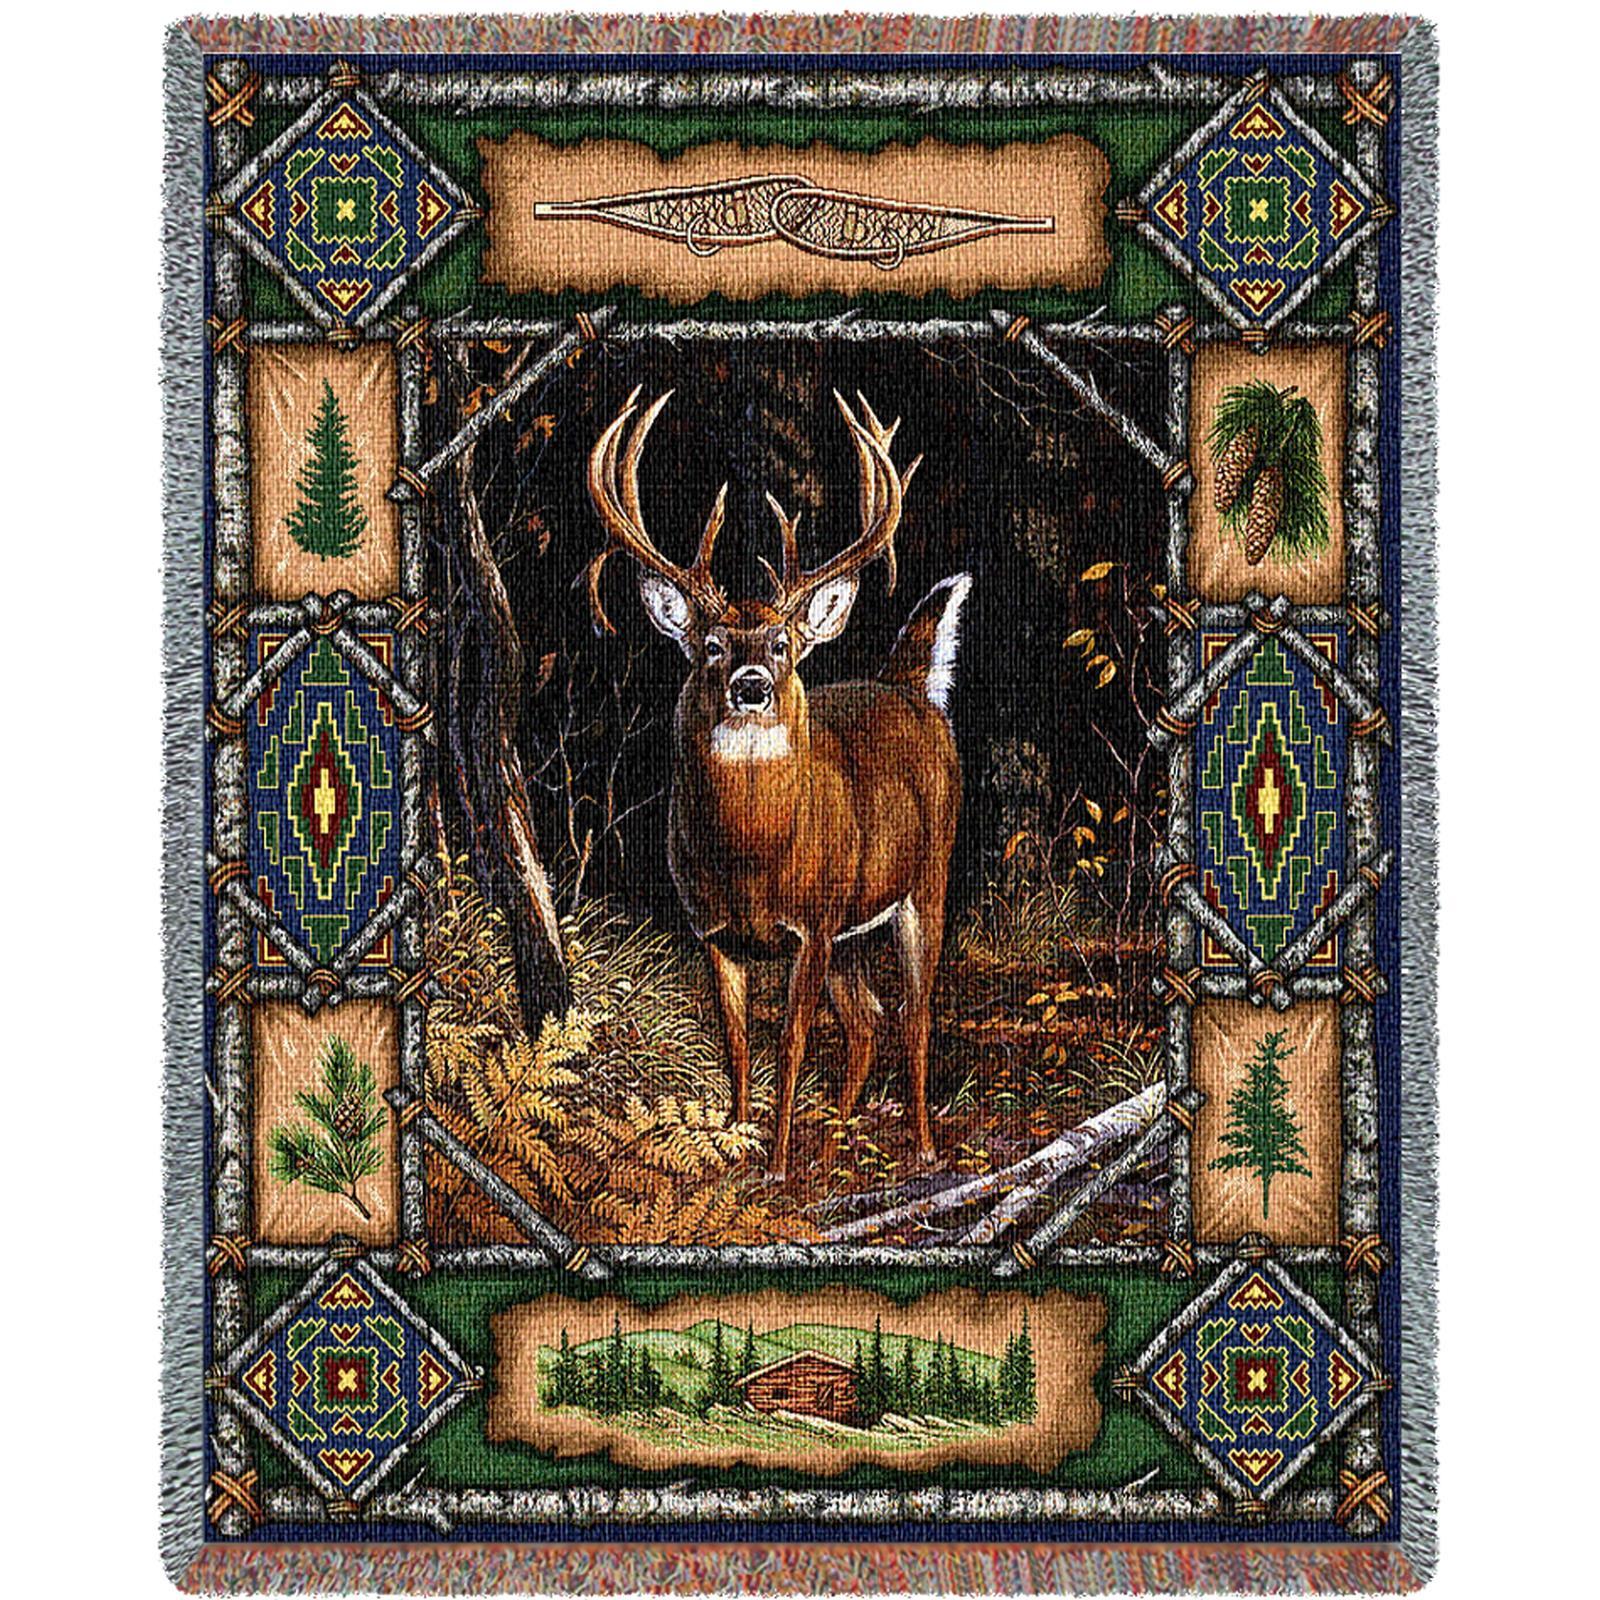 Deer Lodge (lodge) Tapestry Throw